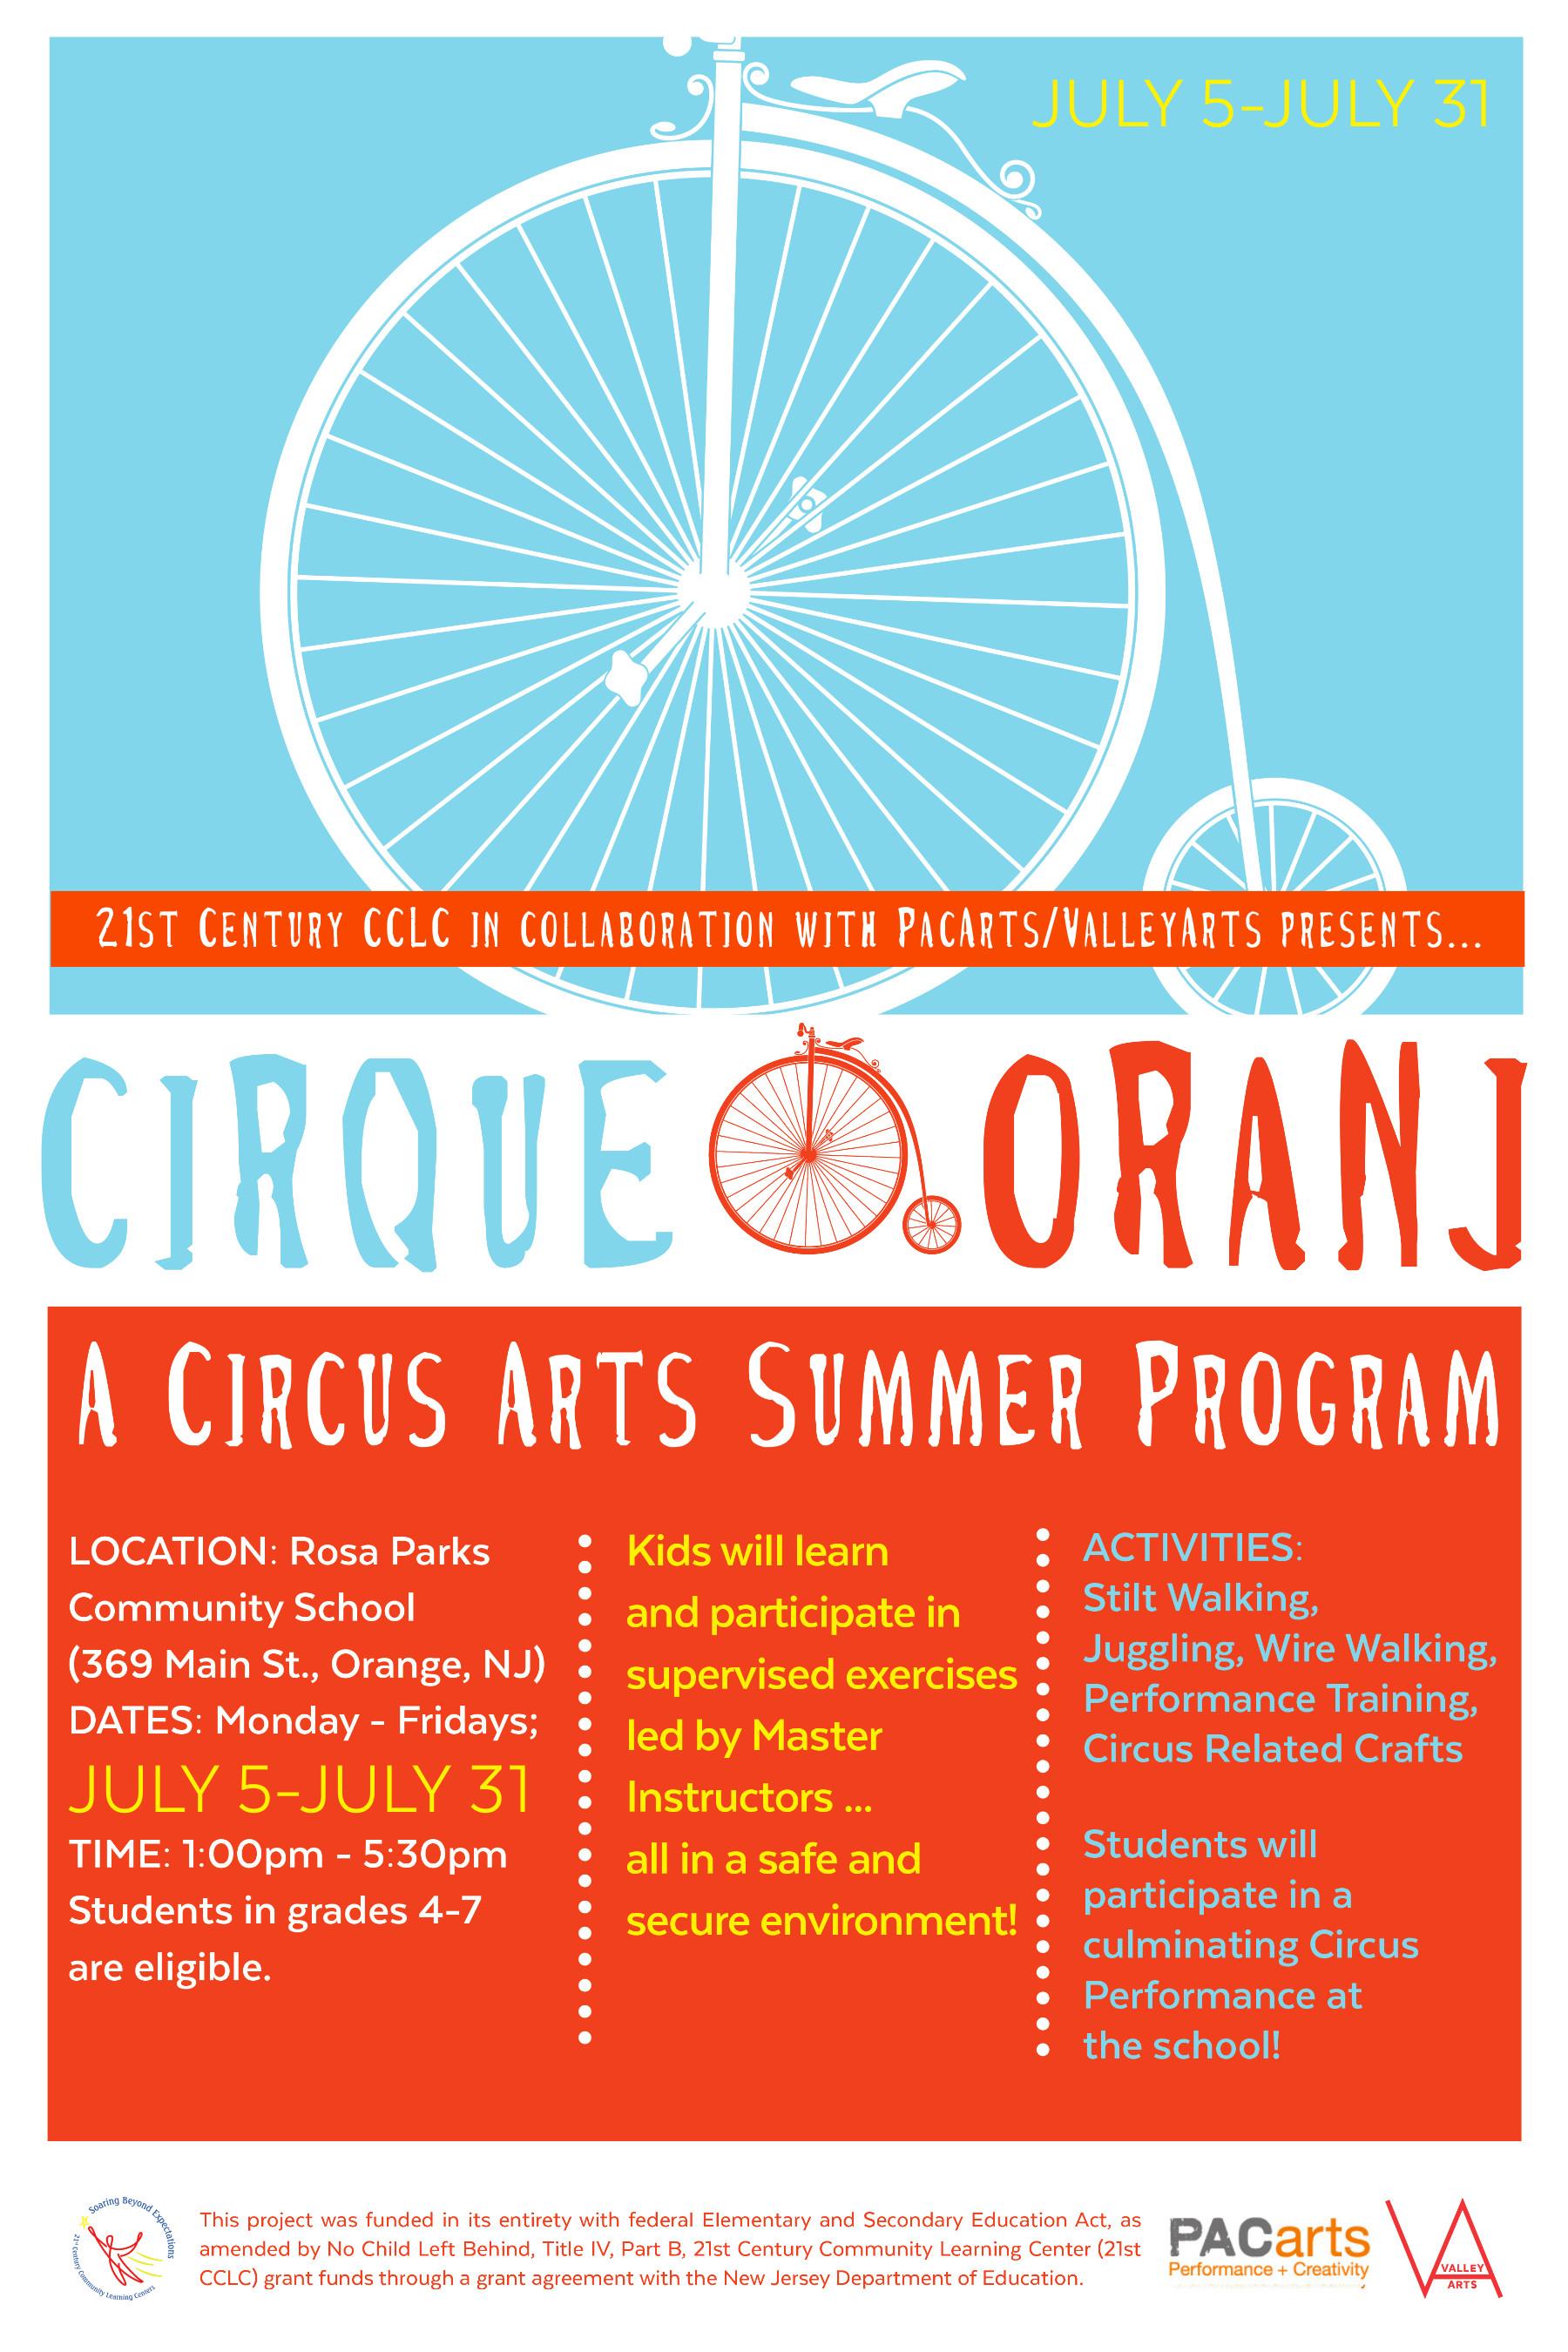 CirqueOranj.12x18.2018.v1 poster.jpg